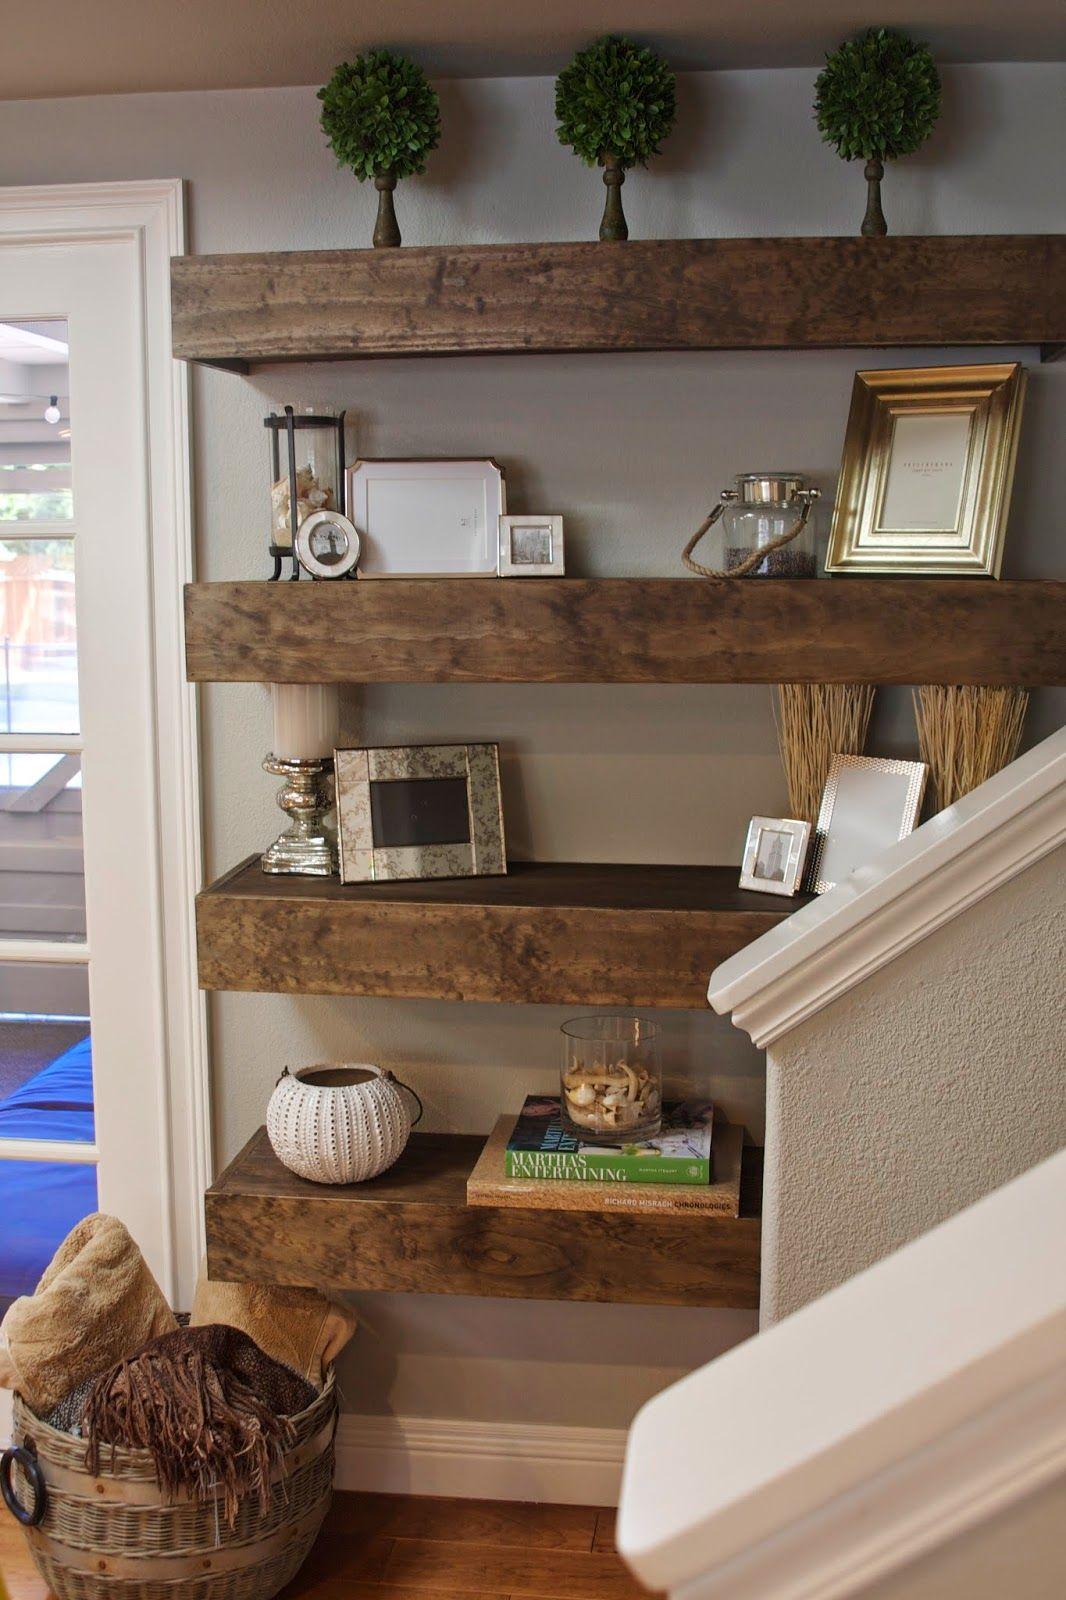 Simply Organized Simple Diy Floating Shelves Tutorial Decor Ideas Floating Shelves Living Room Floating Shelves Diy Floating Shelves